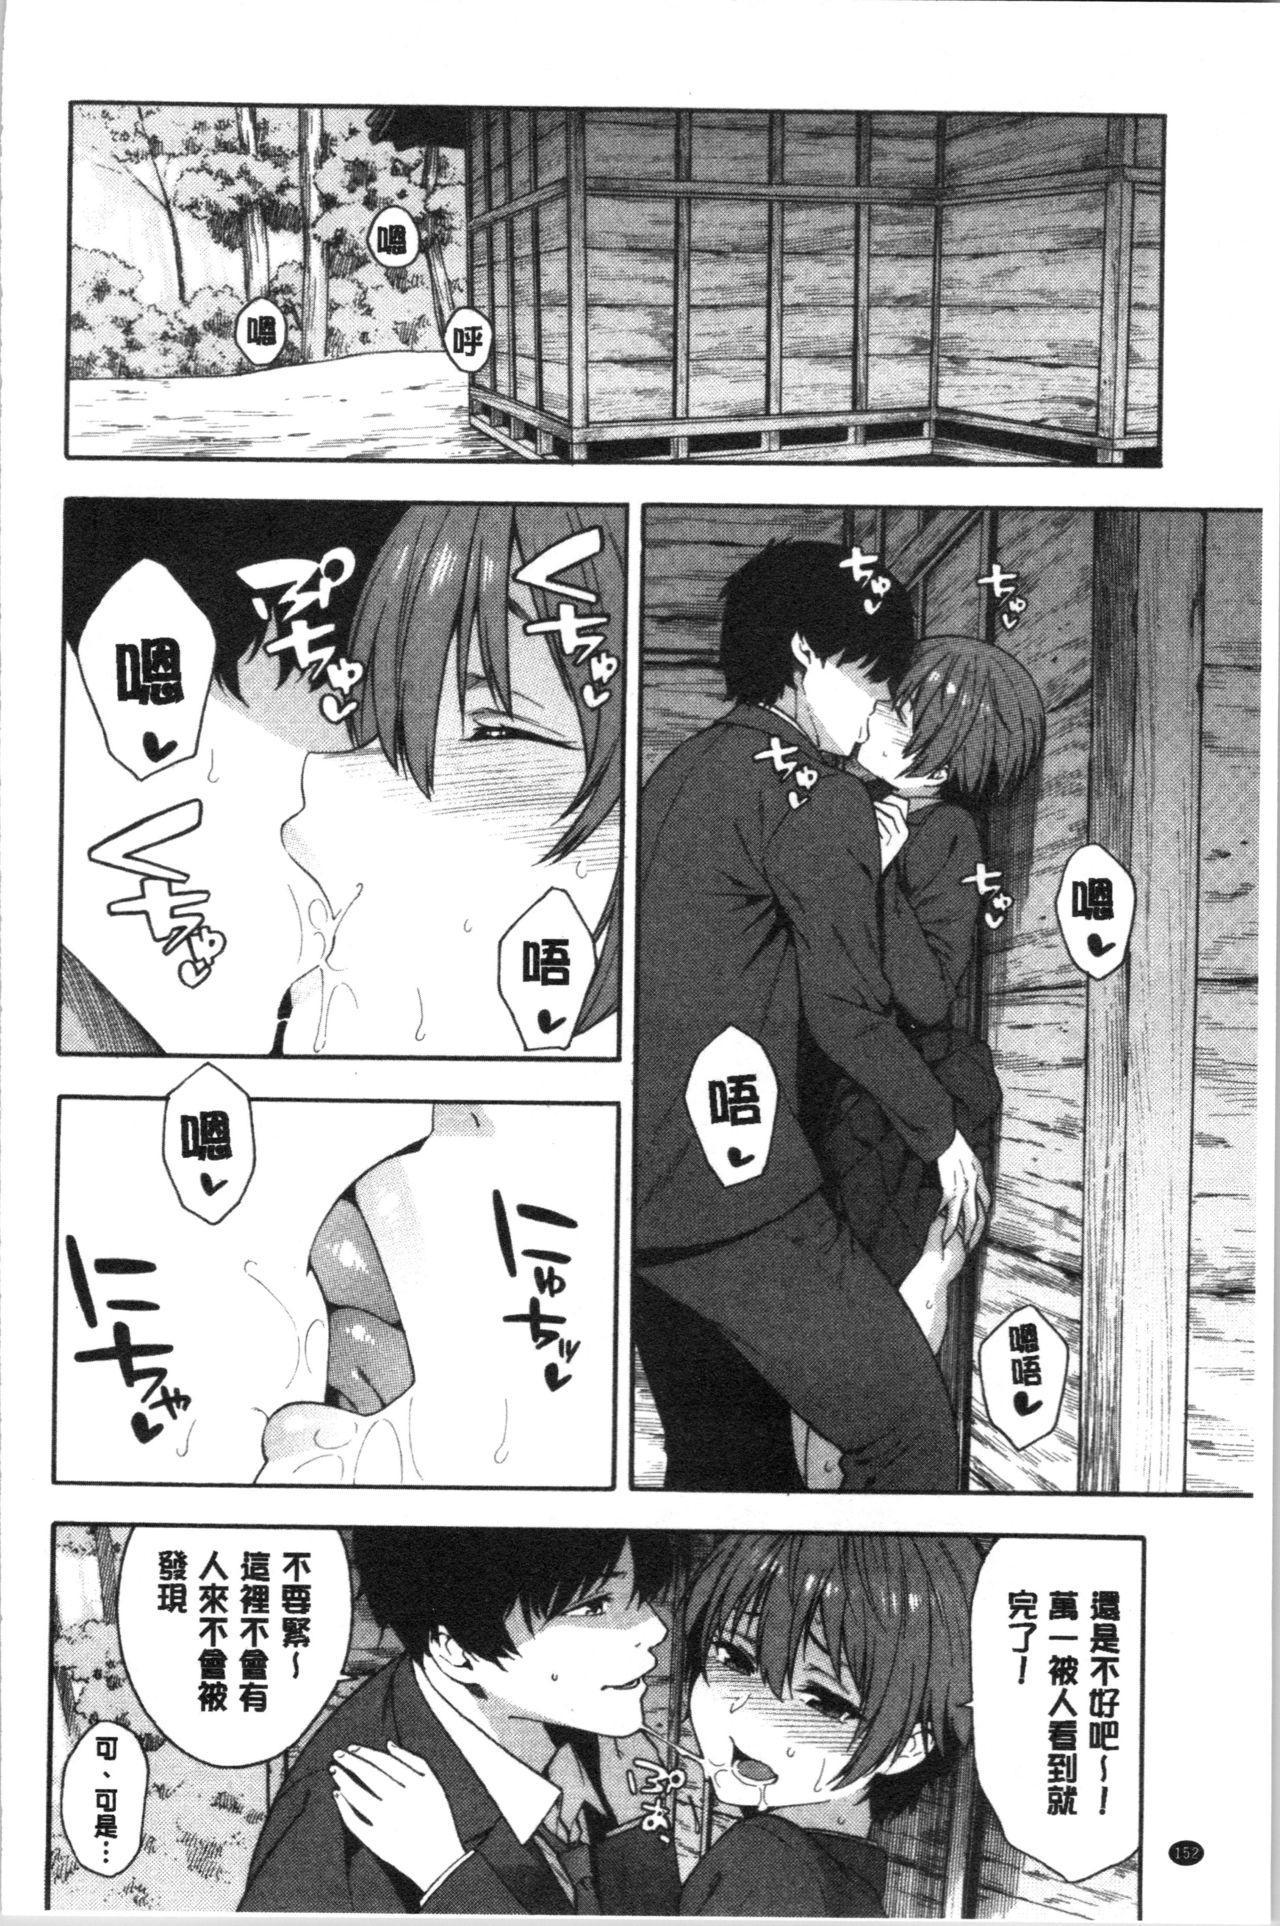 Okashite Ageru | 讓你來侵犯我 154